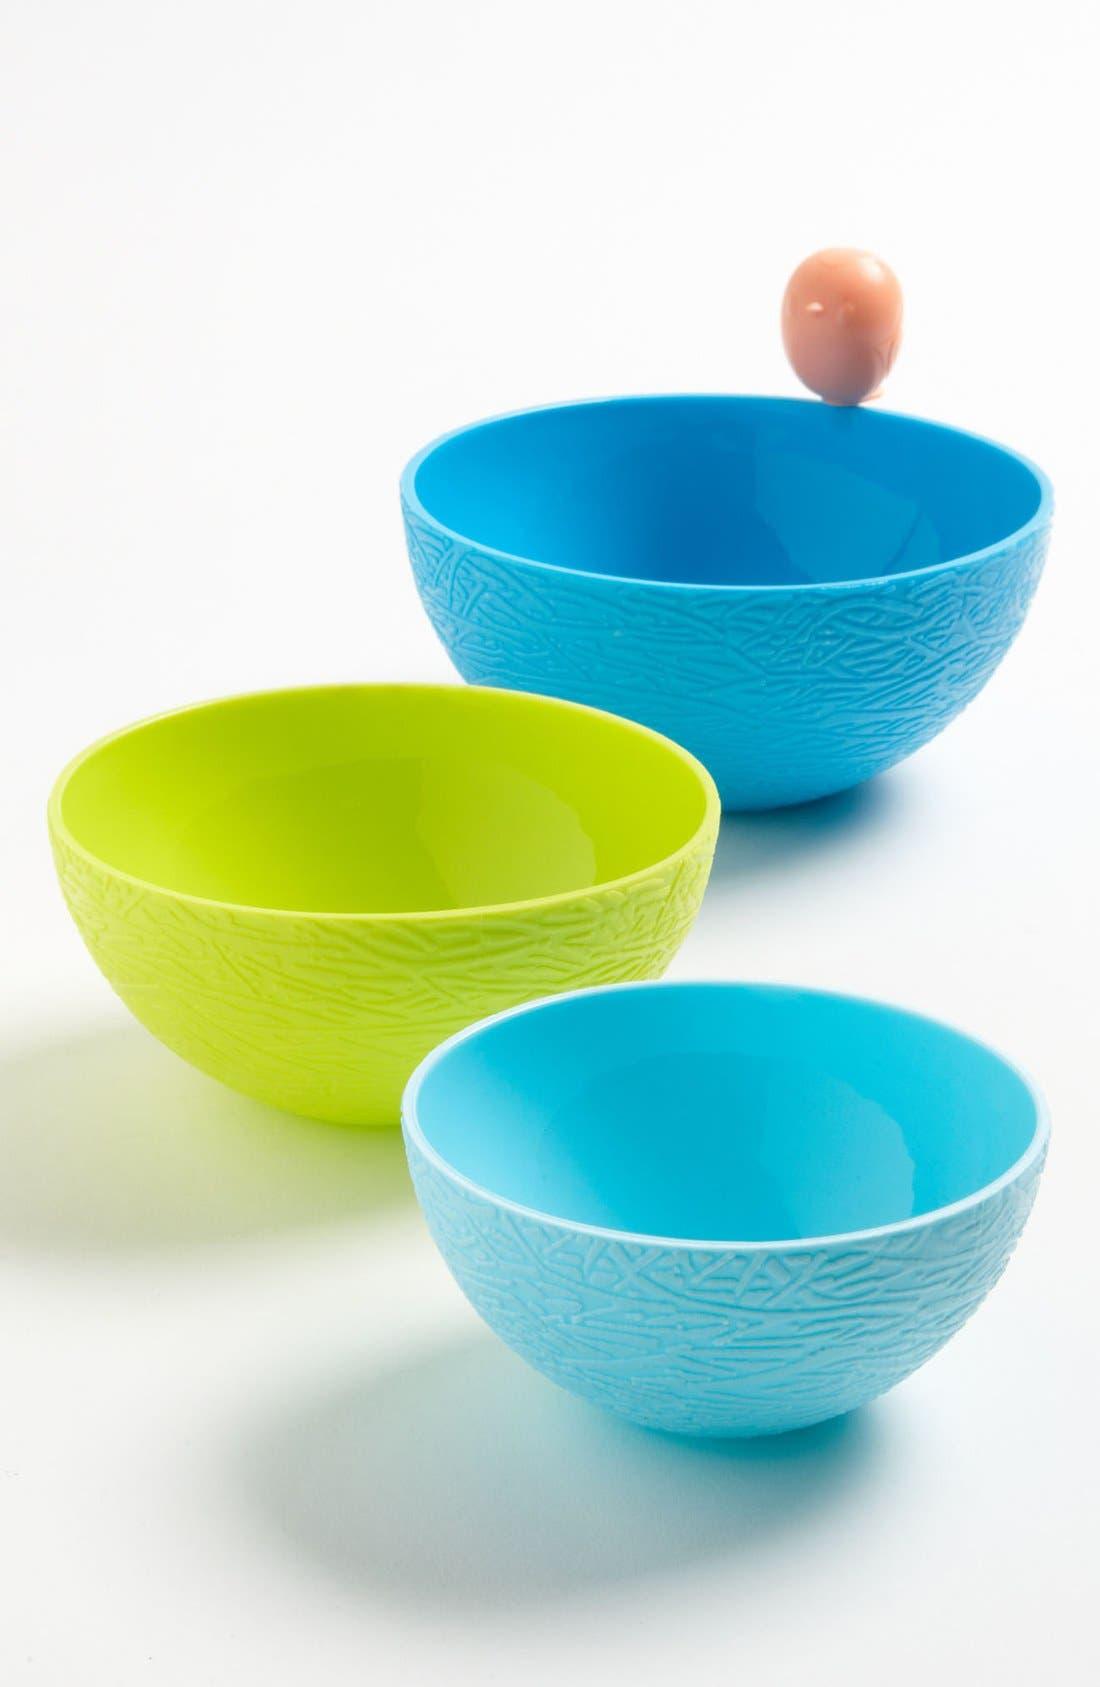 Main Image - Nesting Bowls (Set of 3)